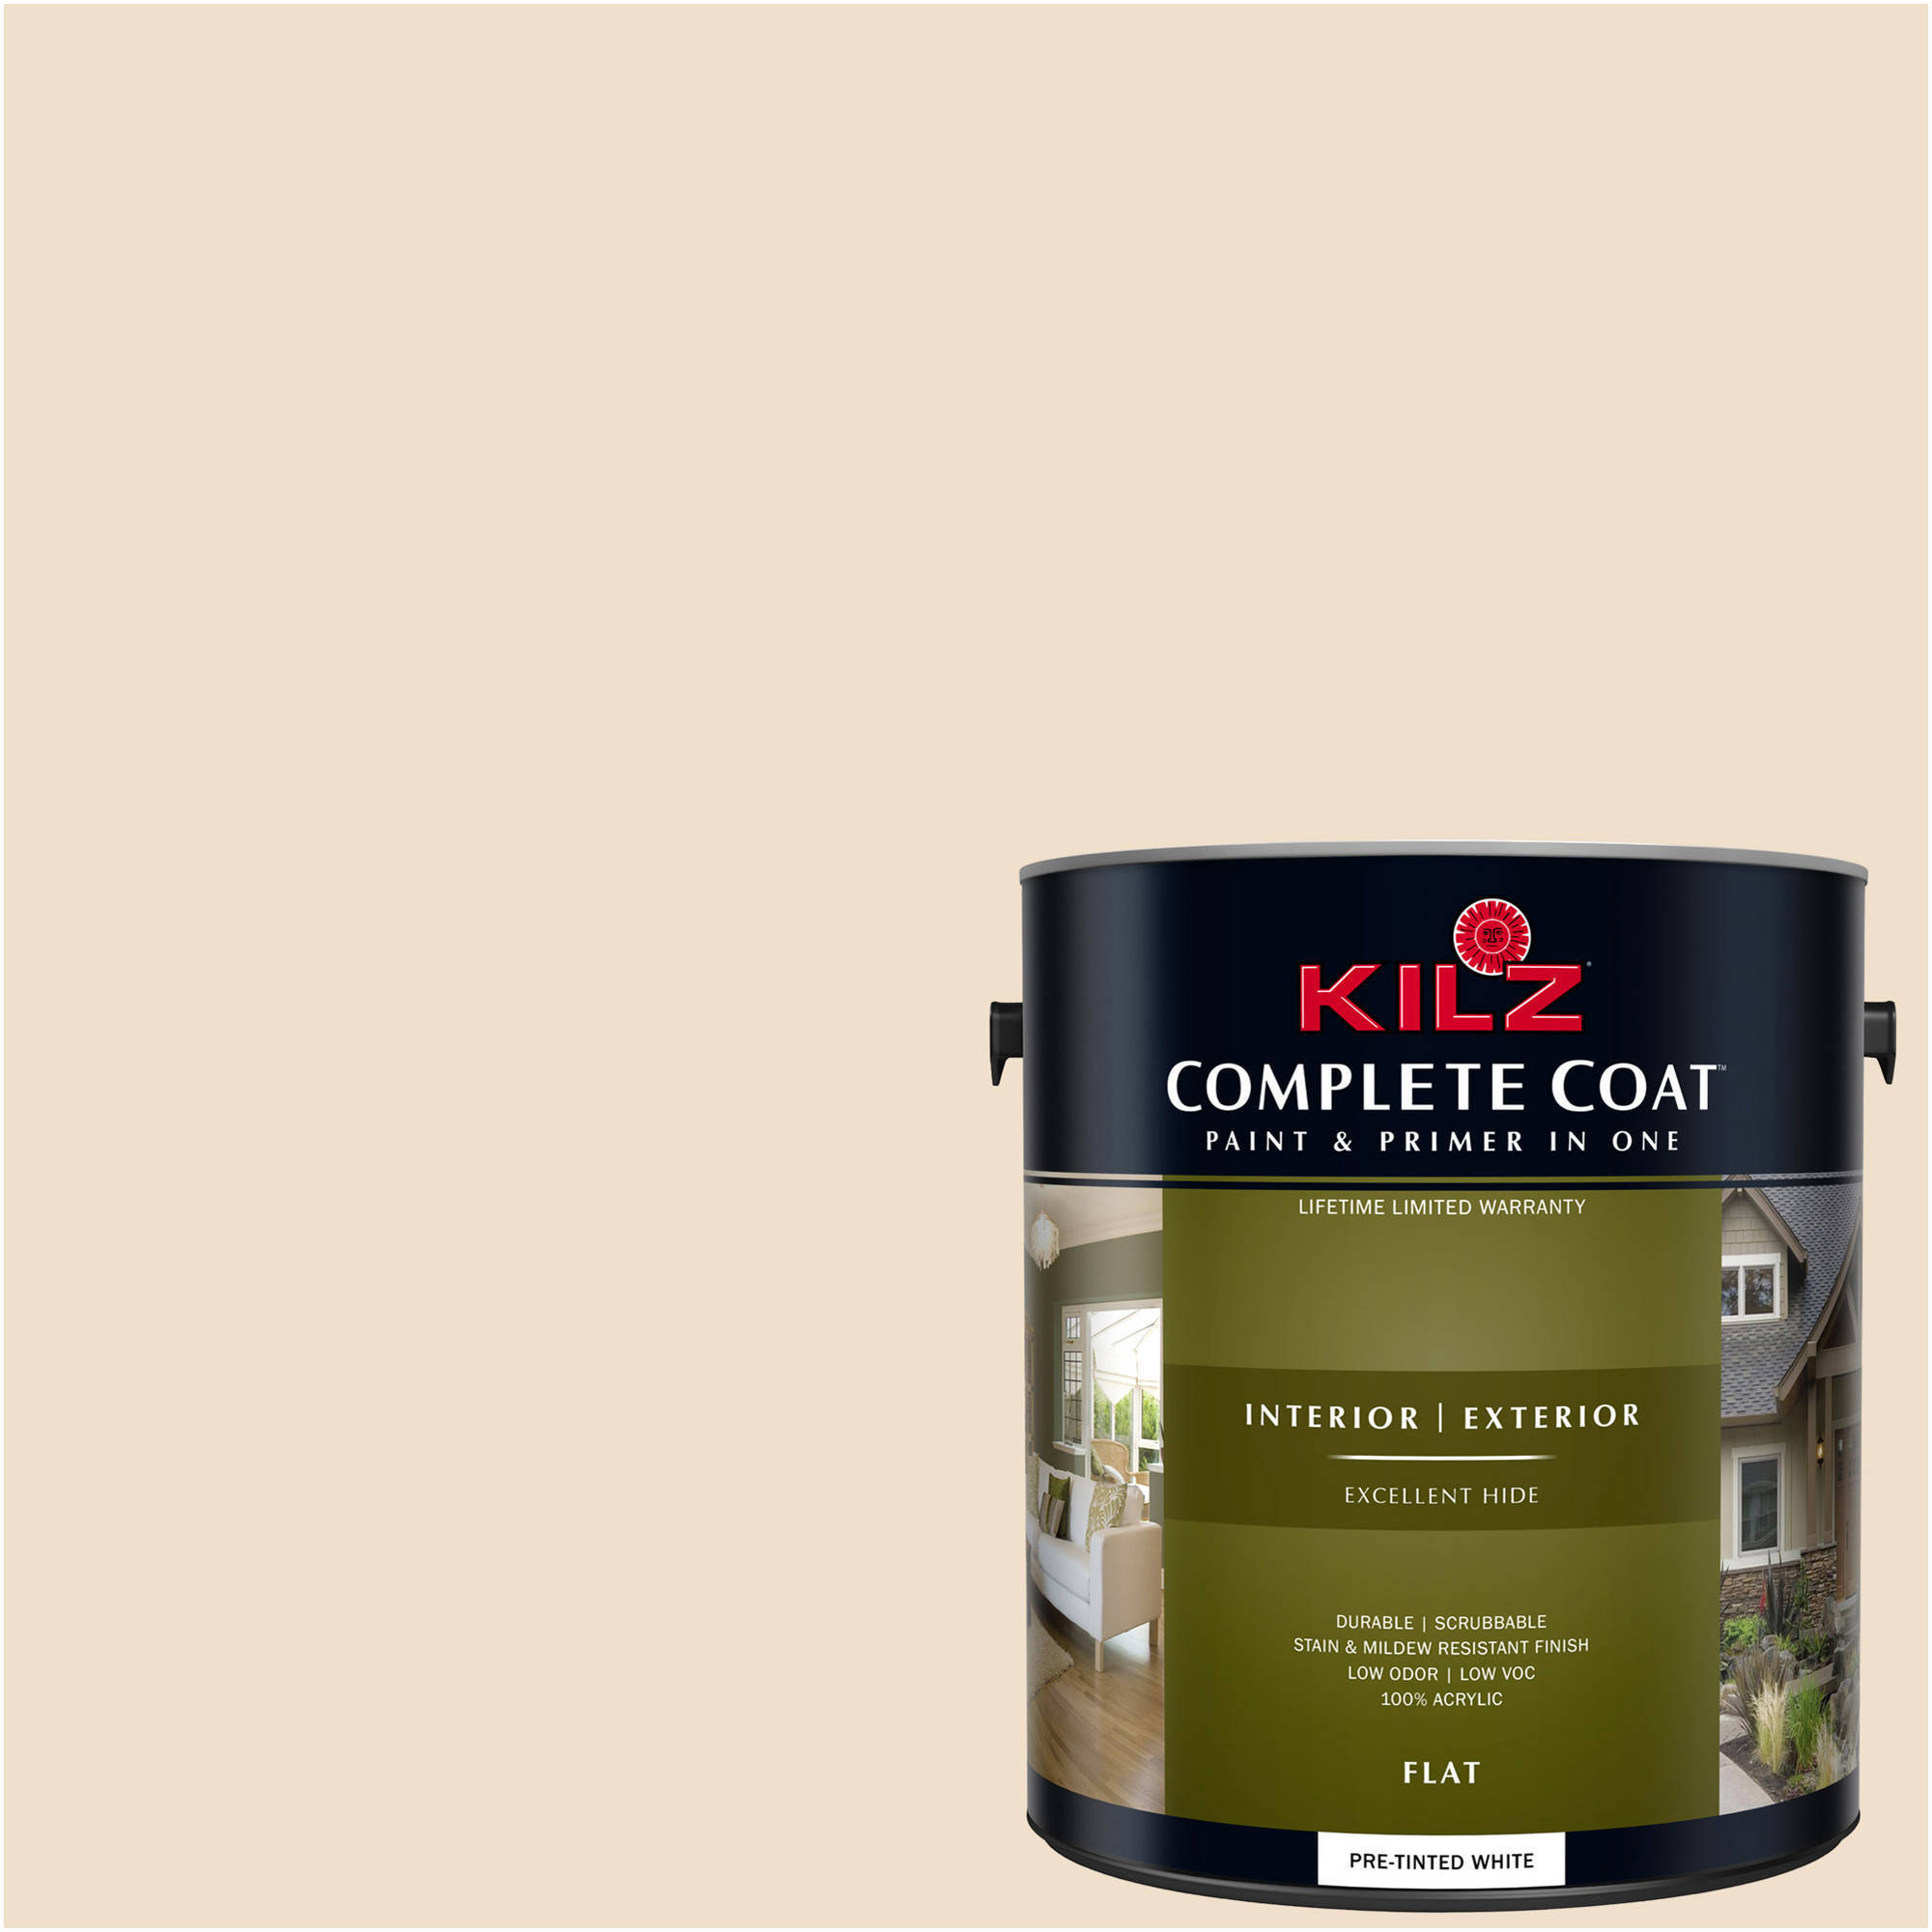 KILZ COMPLETE COAT Interior/Exterior Paint & Primer in One #LJ120 Sugar Beige